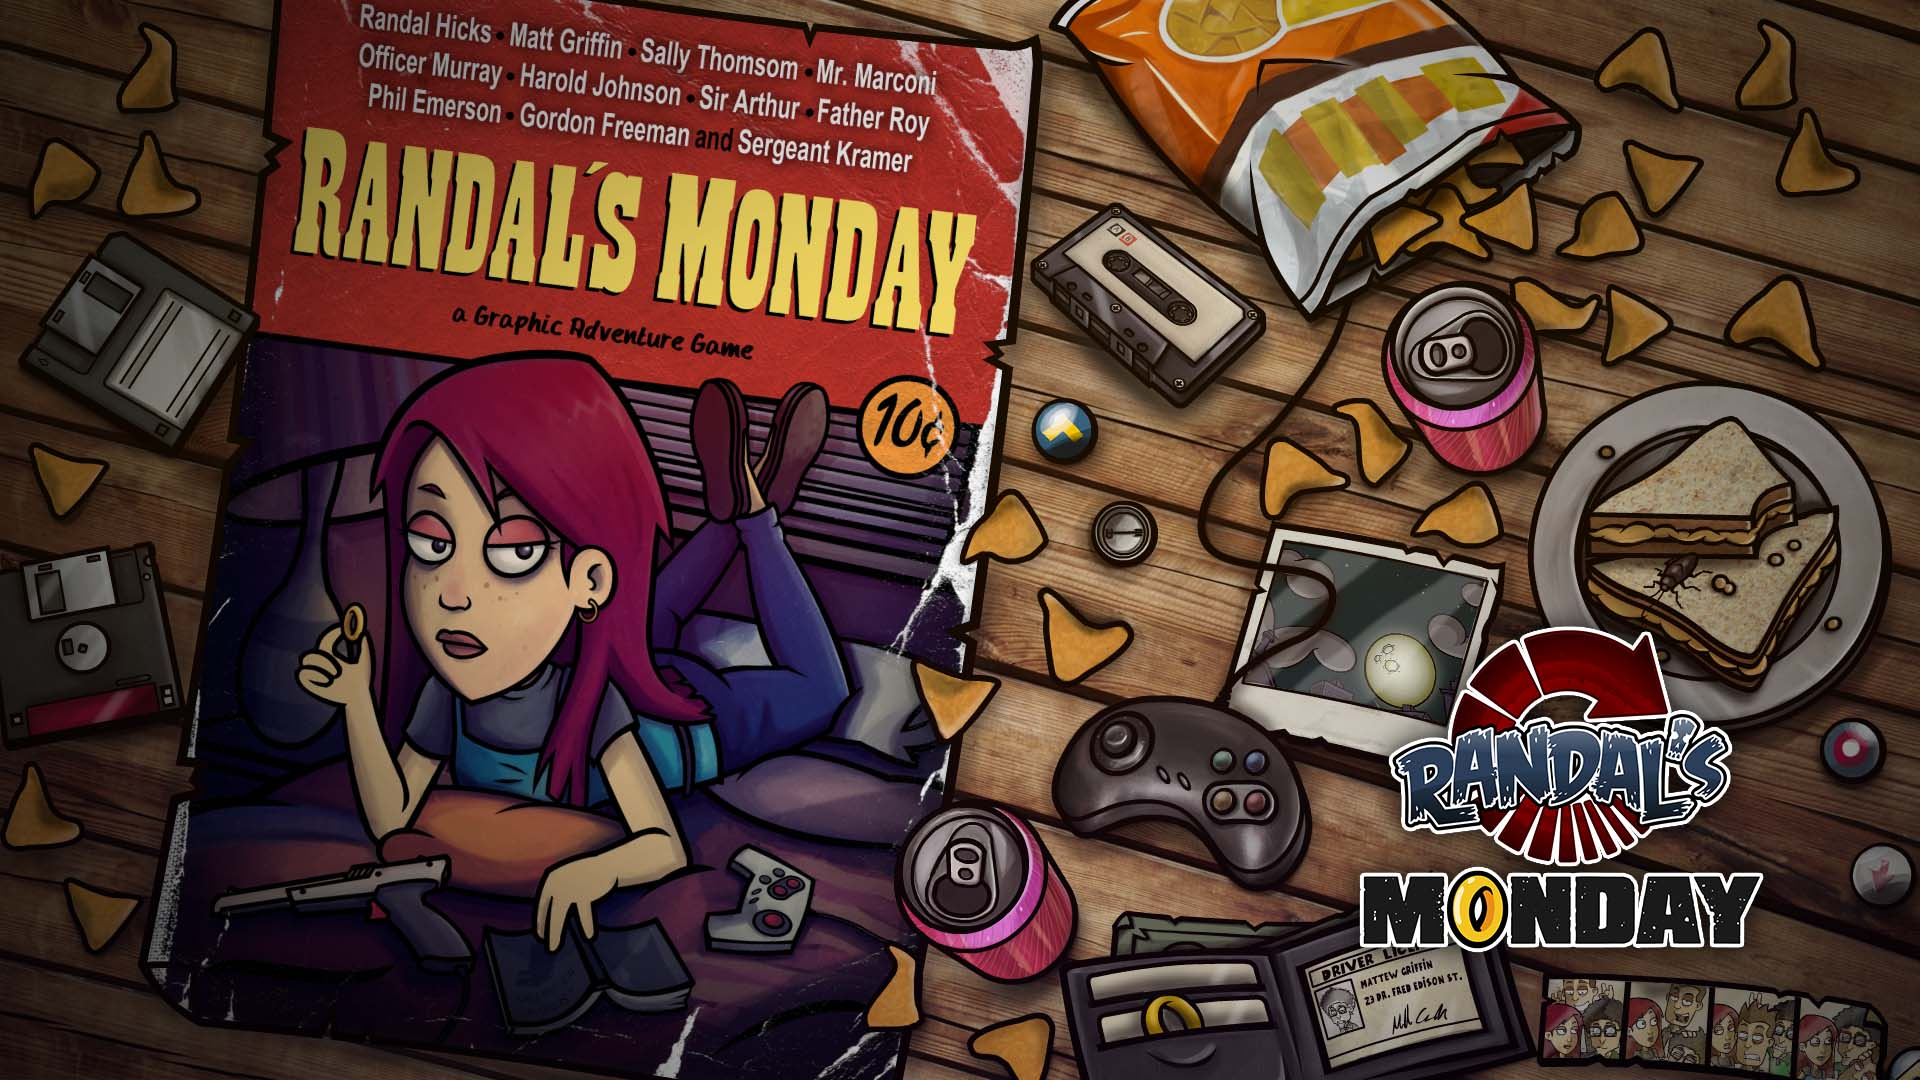 image randals monday artwork 3 jpg steam trading cards wiki